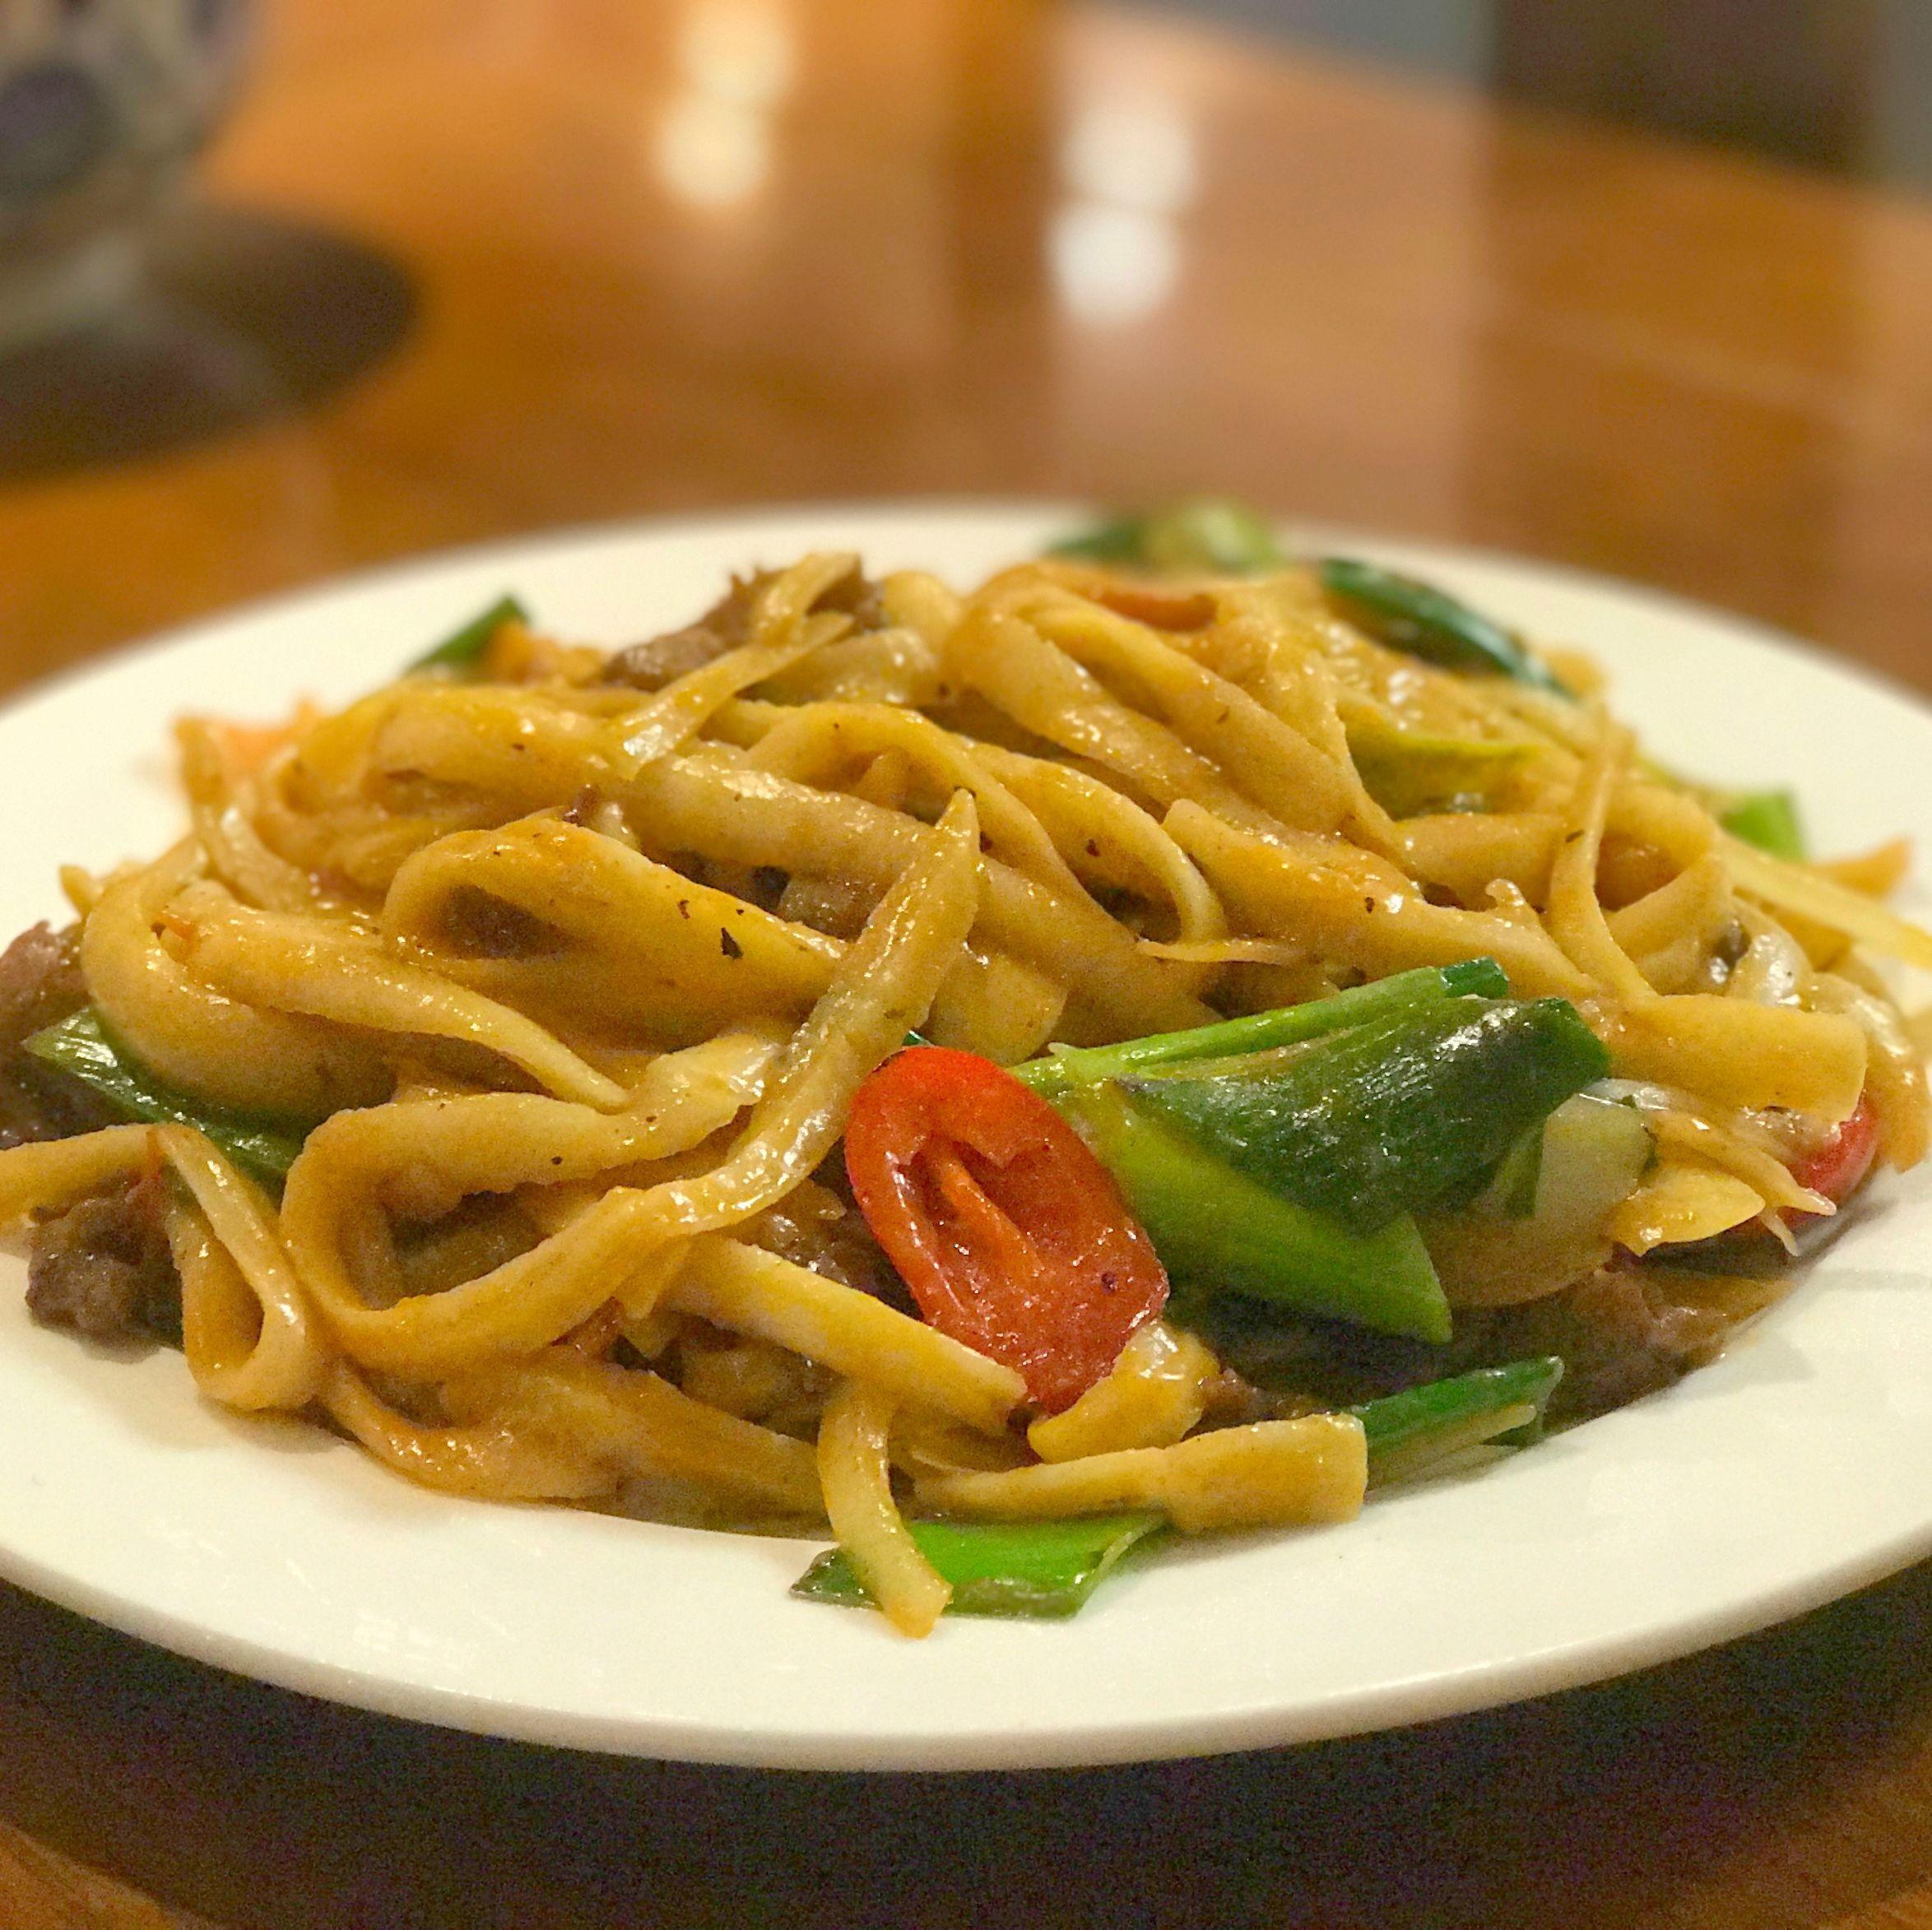 Noodles ehygfg